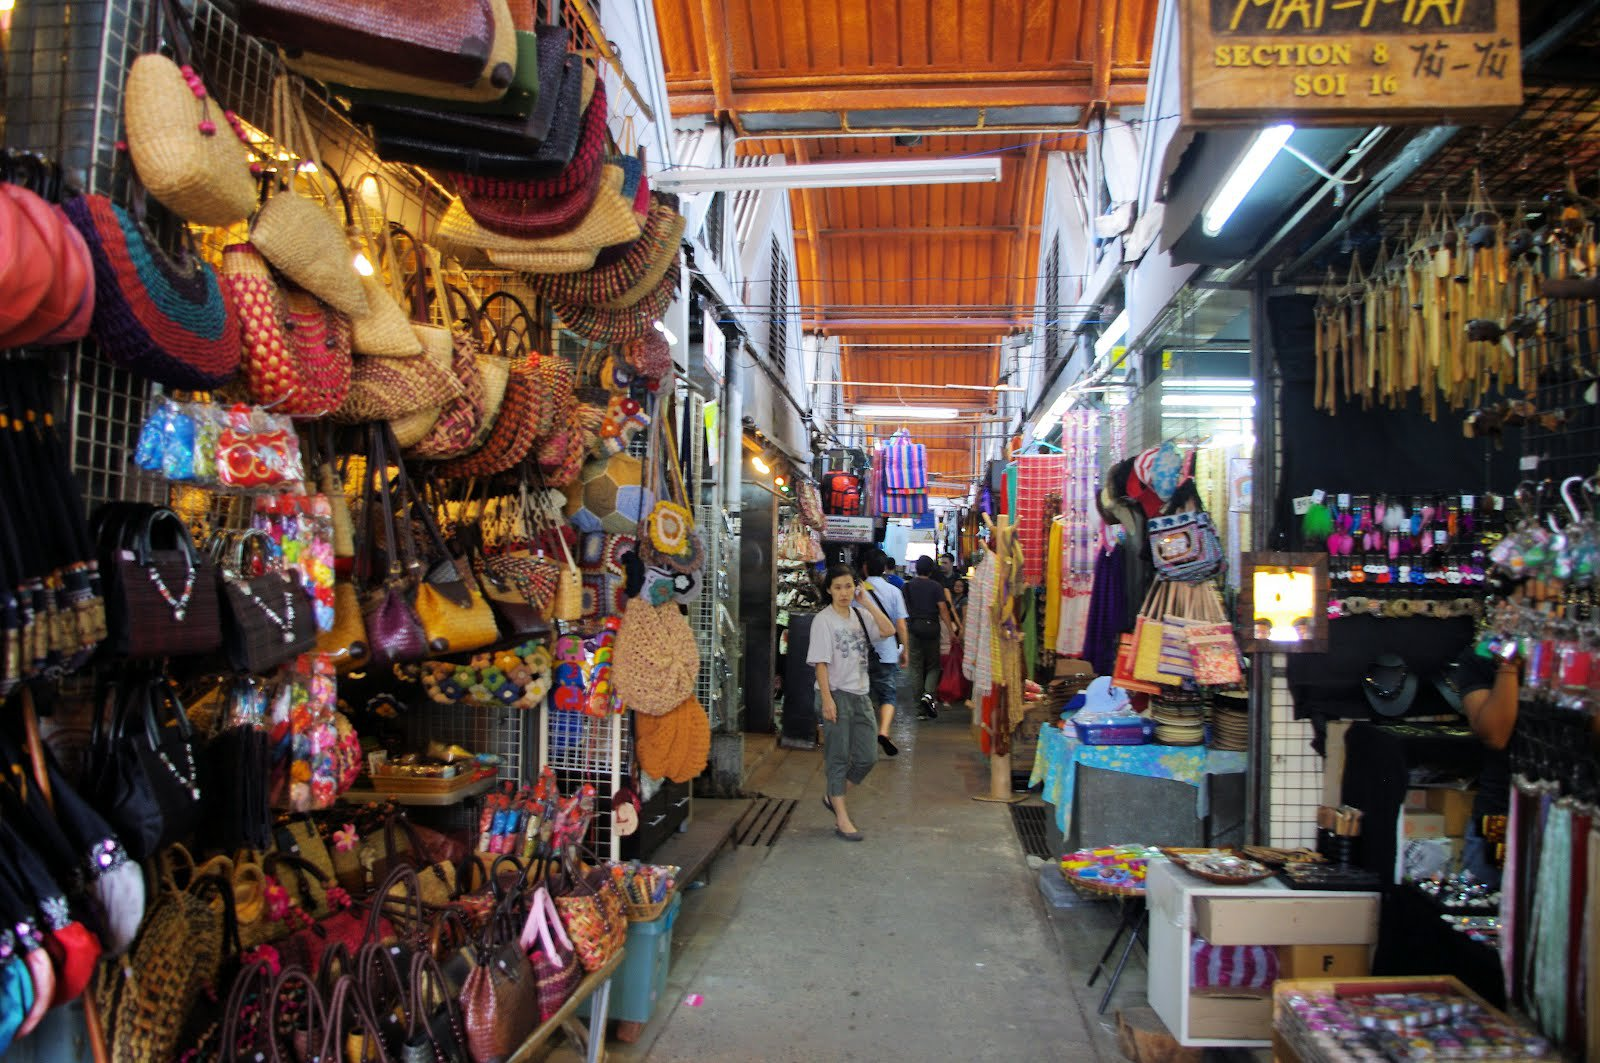 Mua sắm tại chợ Chatuchak